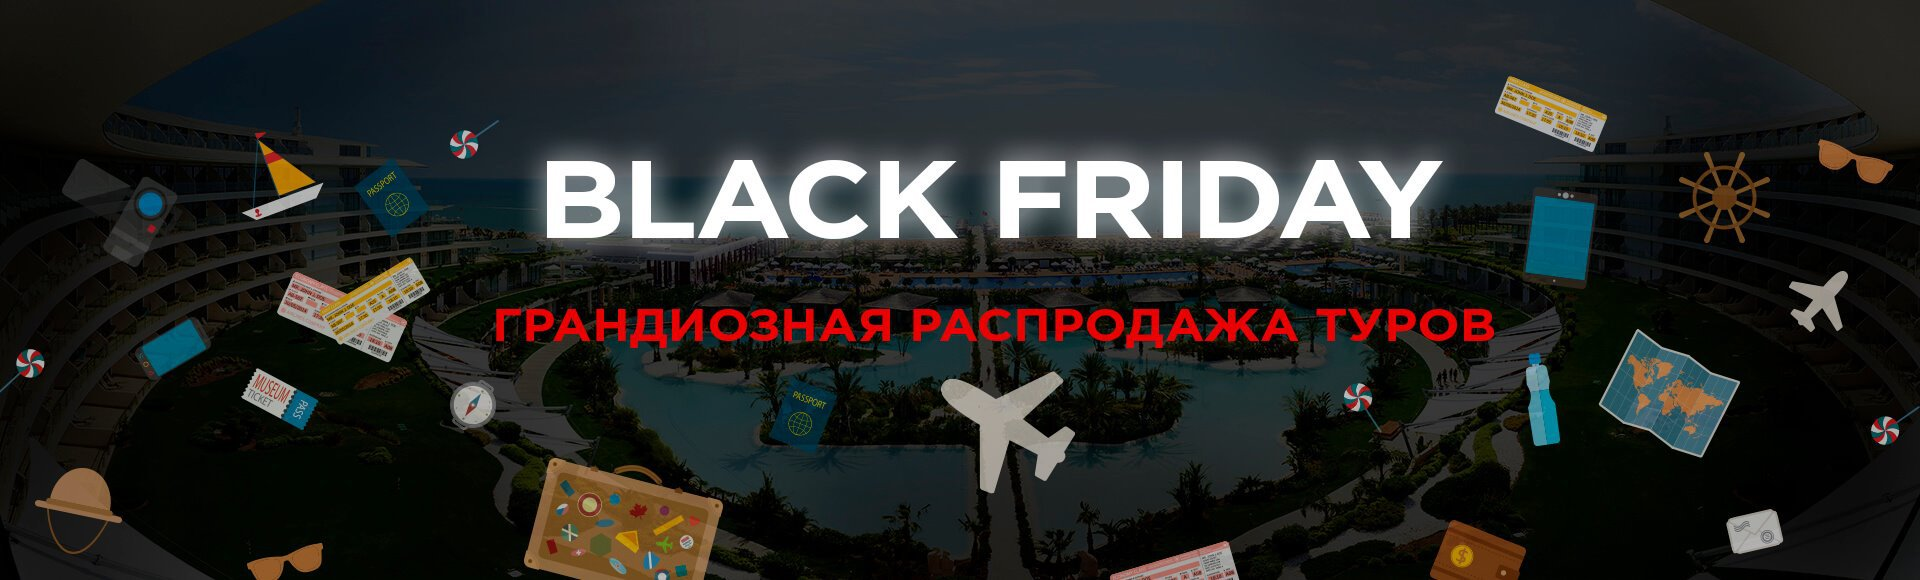 Картинки по запросу черная пятница Coral travel